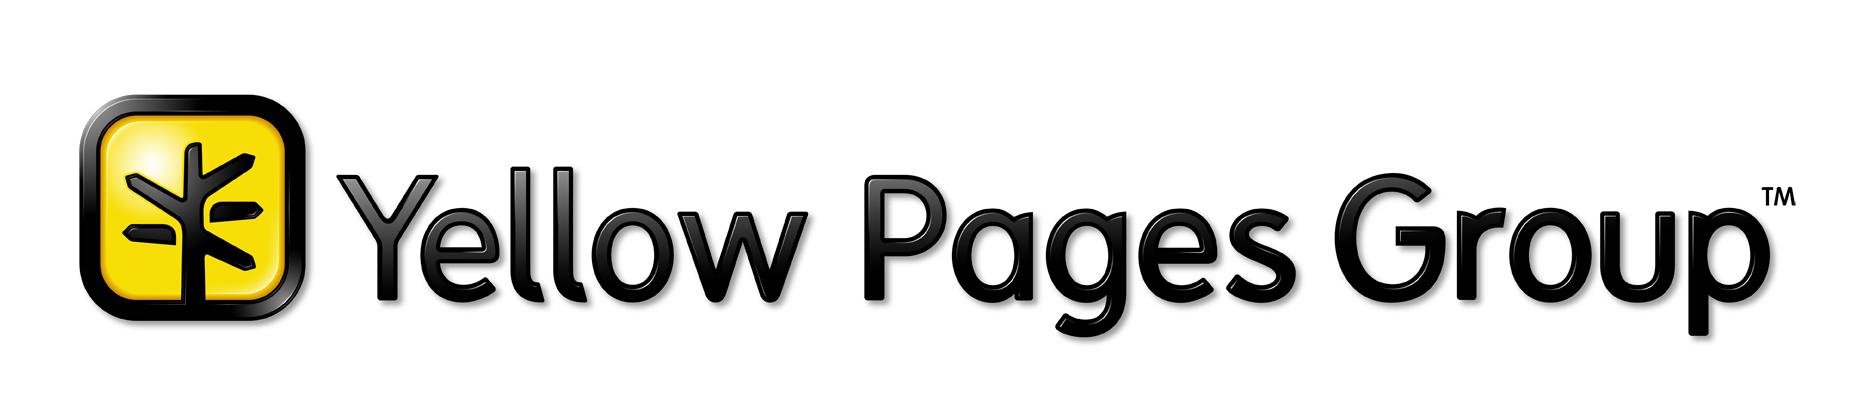 ypg_medialogo_nostrap_hires1.jpg